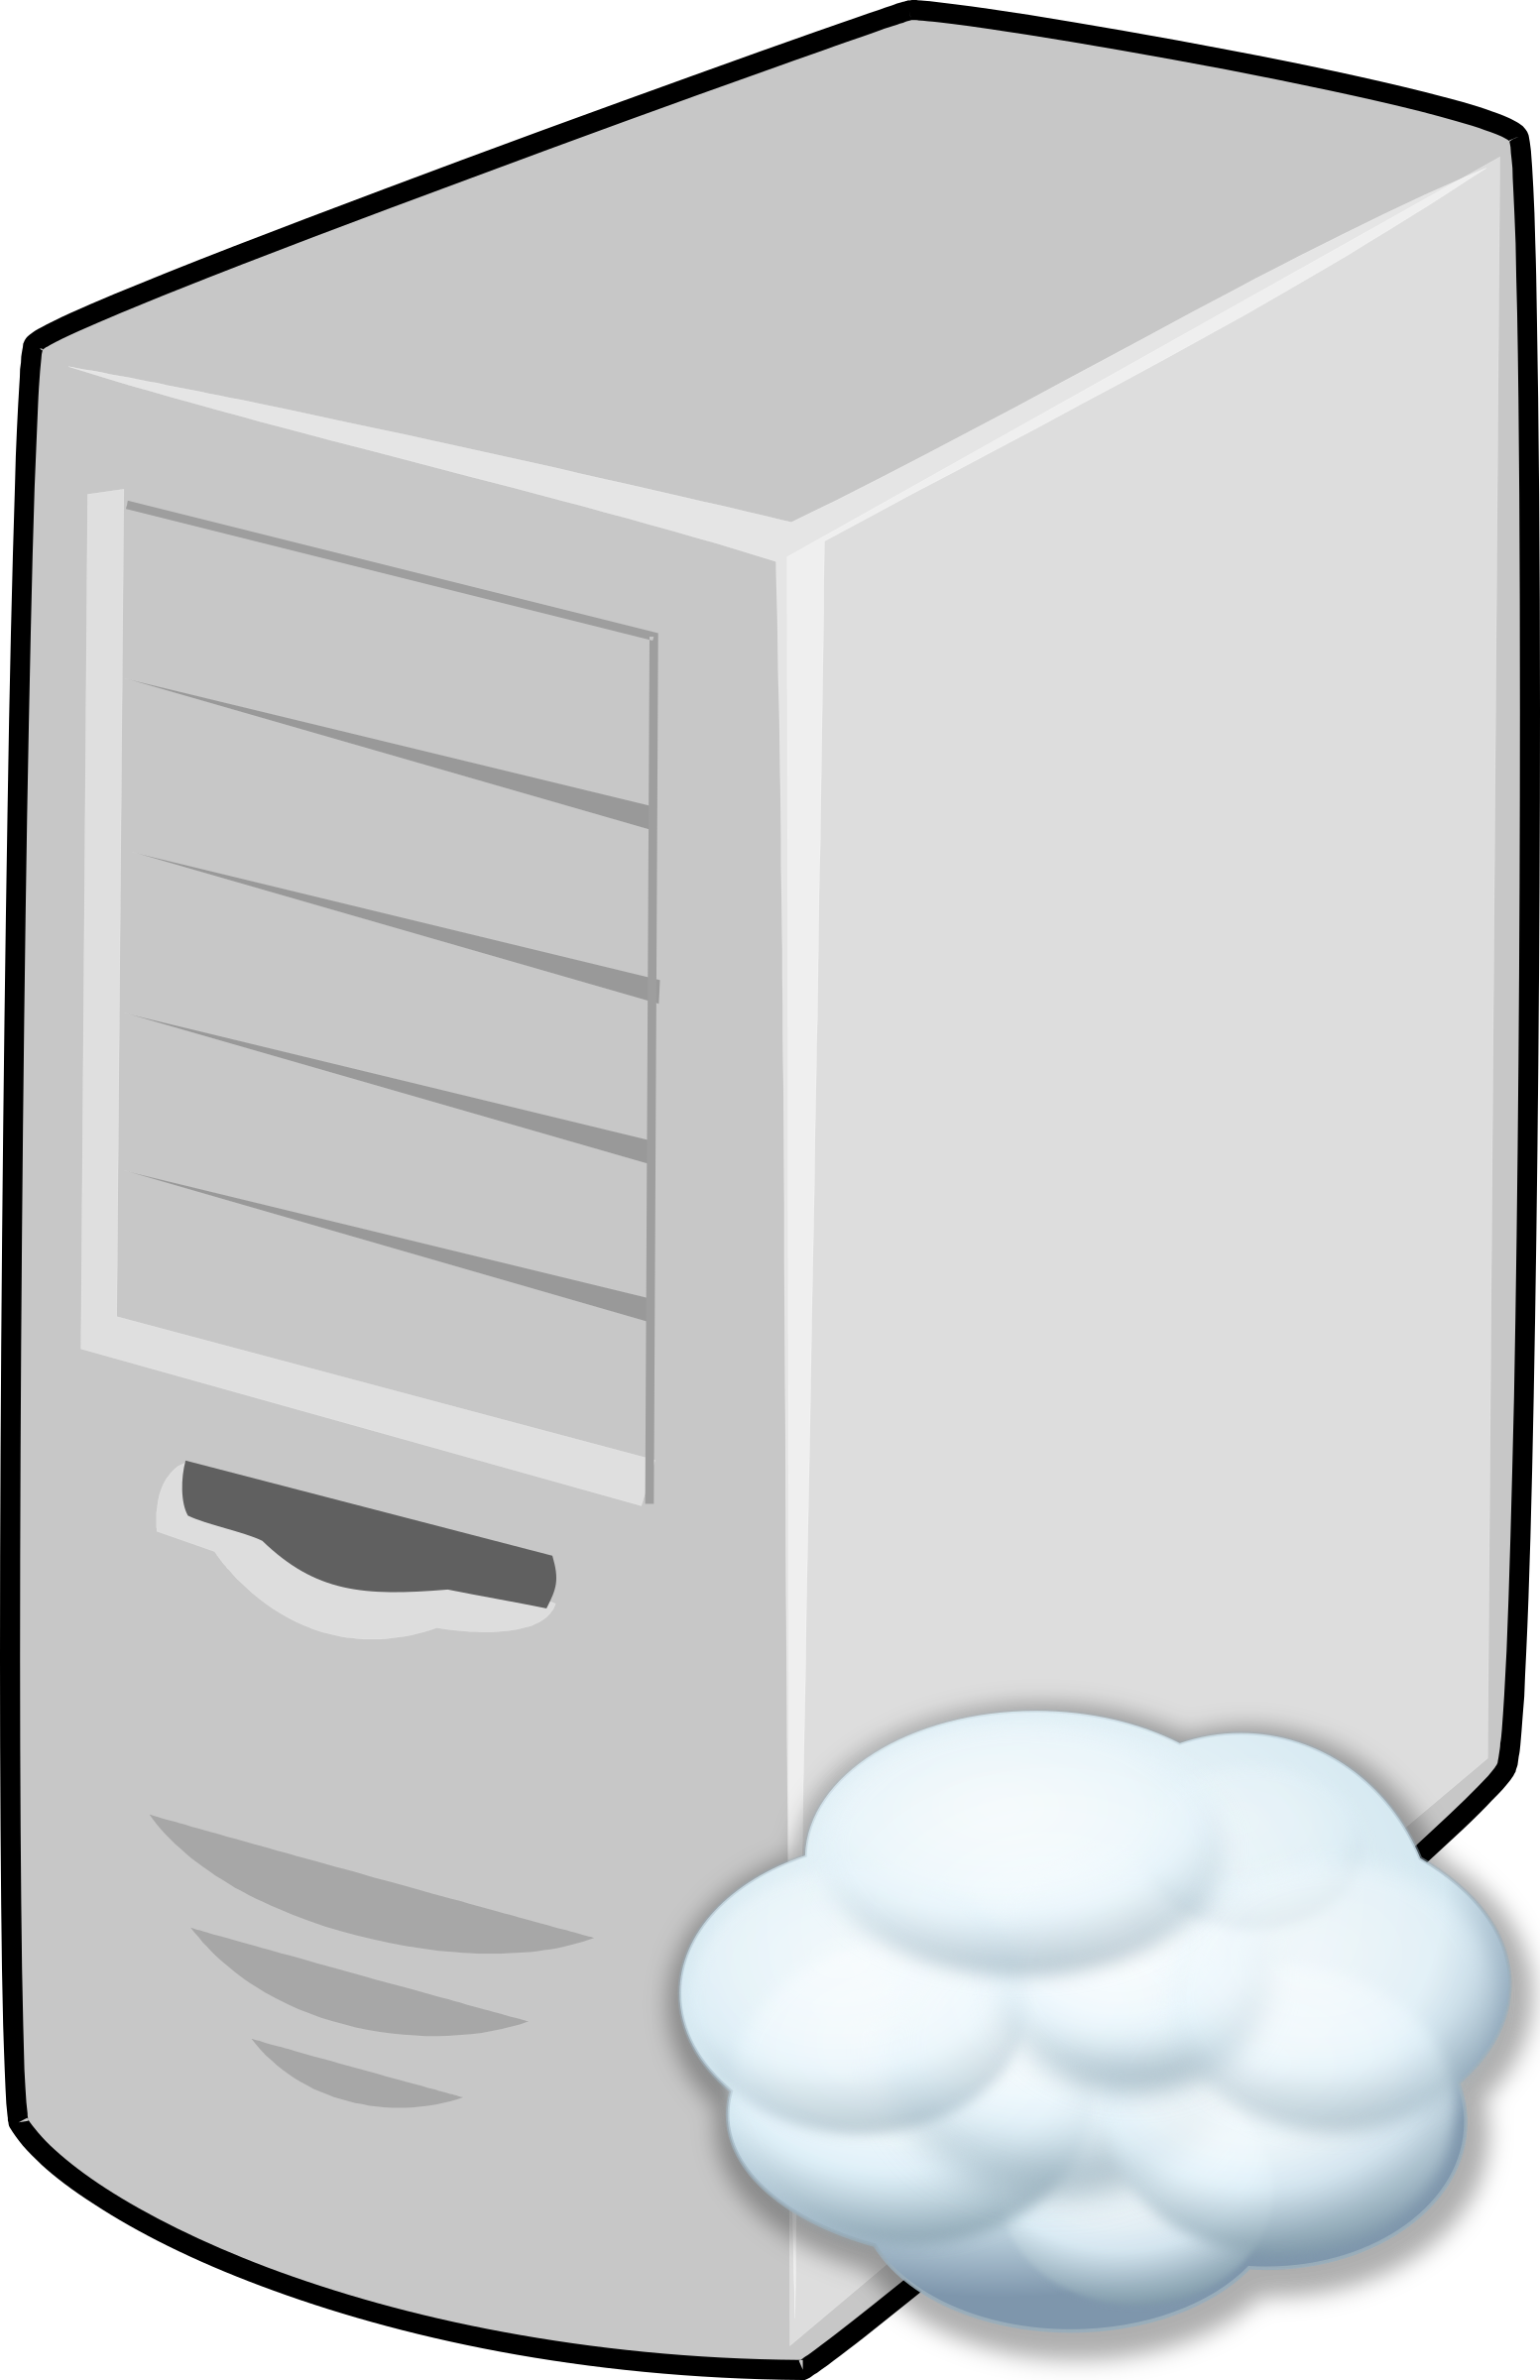 clip library download Server clipart. Cloud big image png